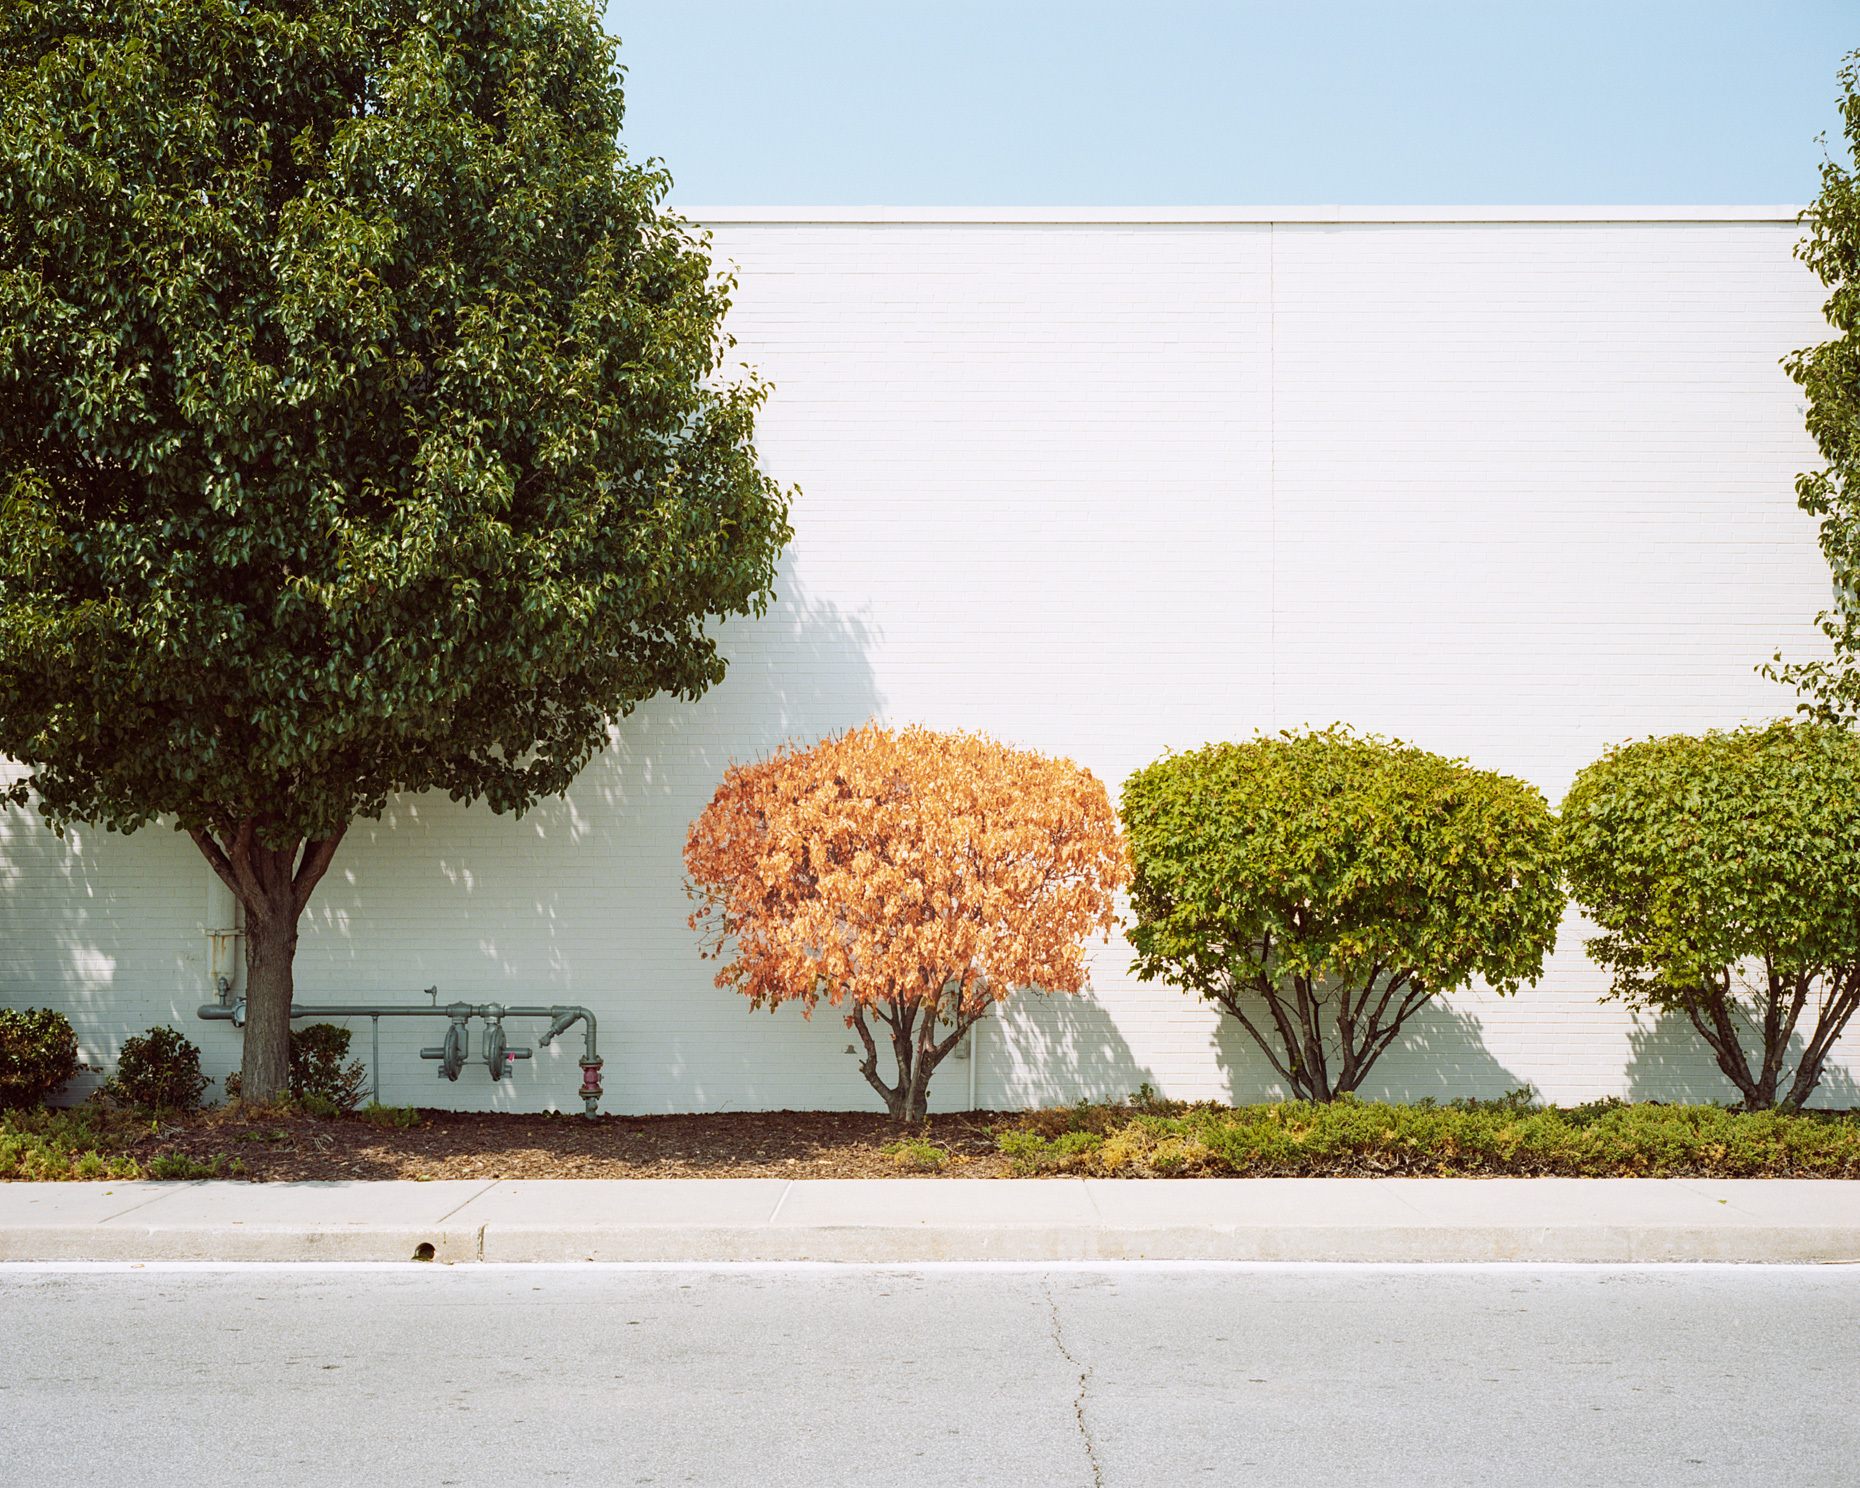 Rieser environments 14